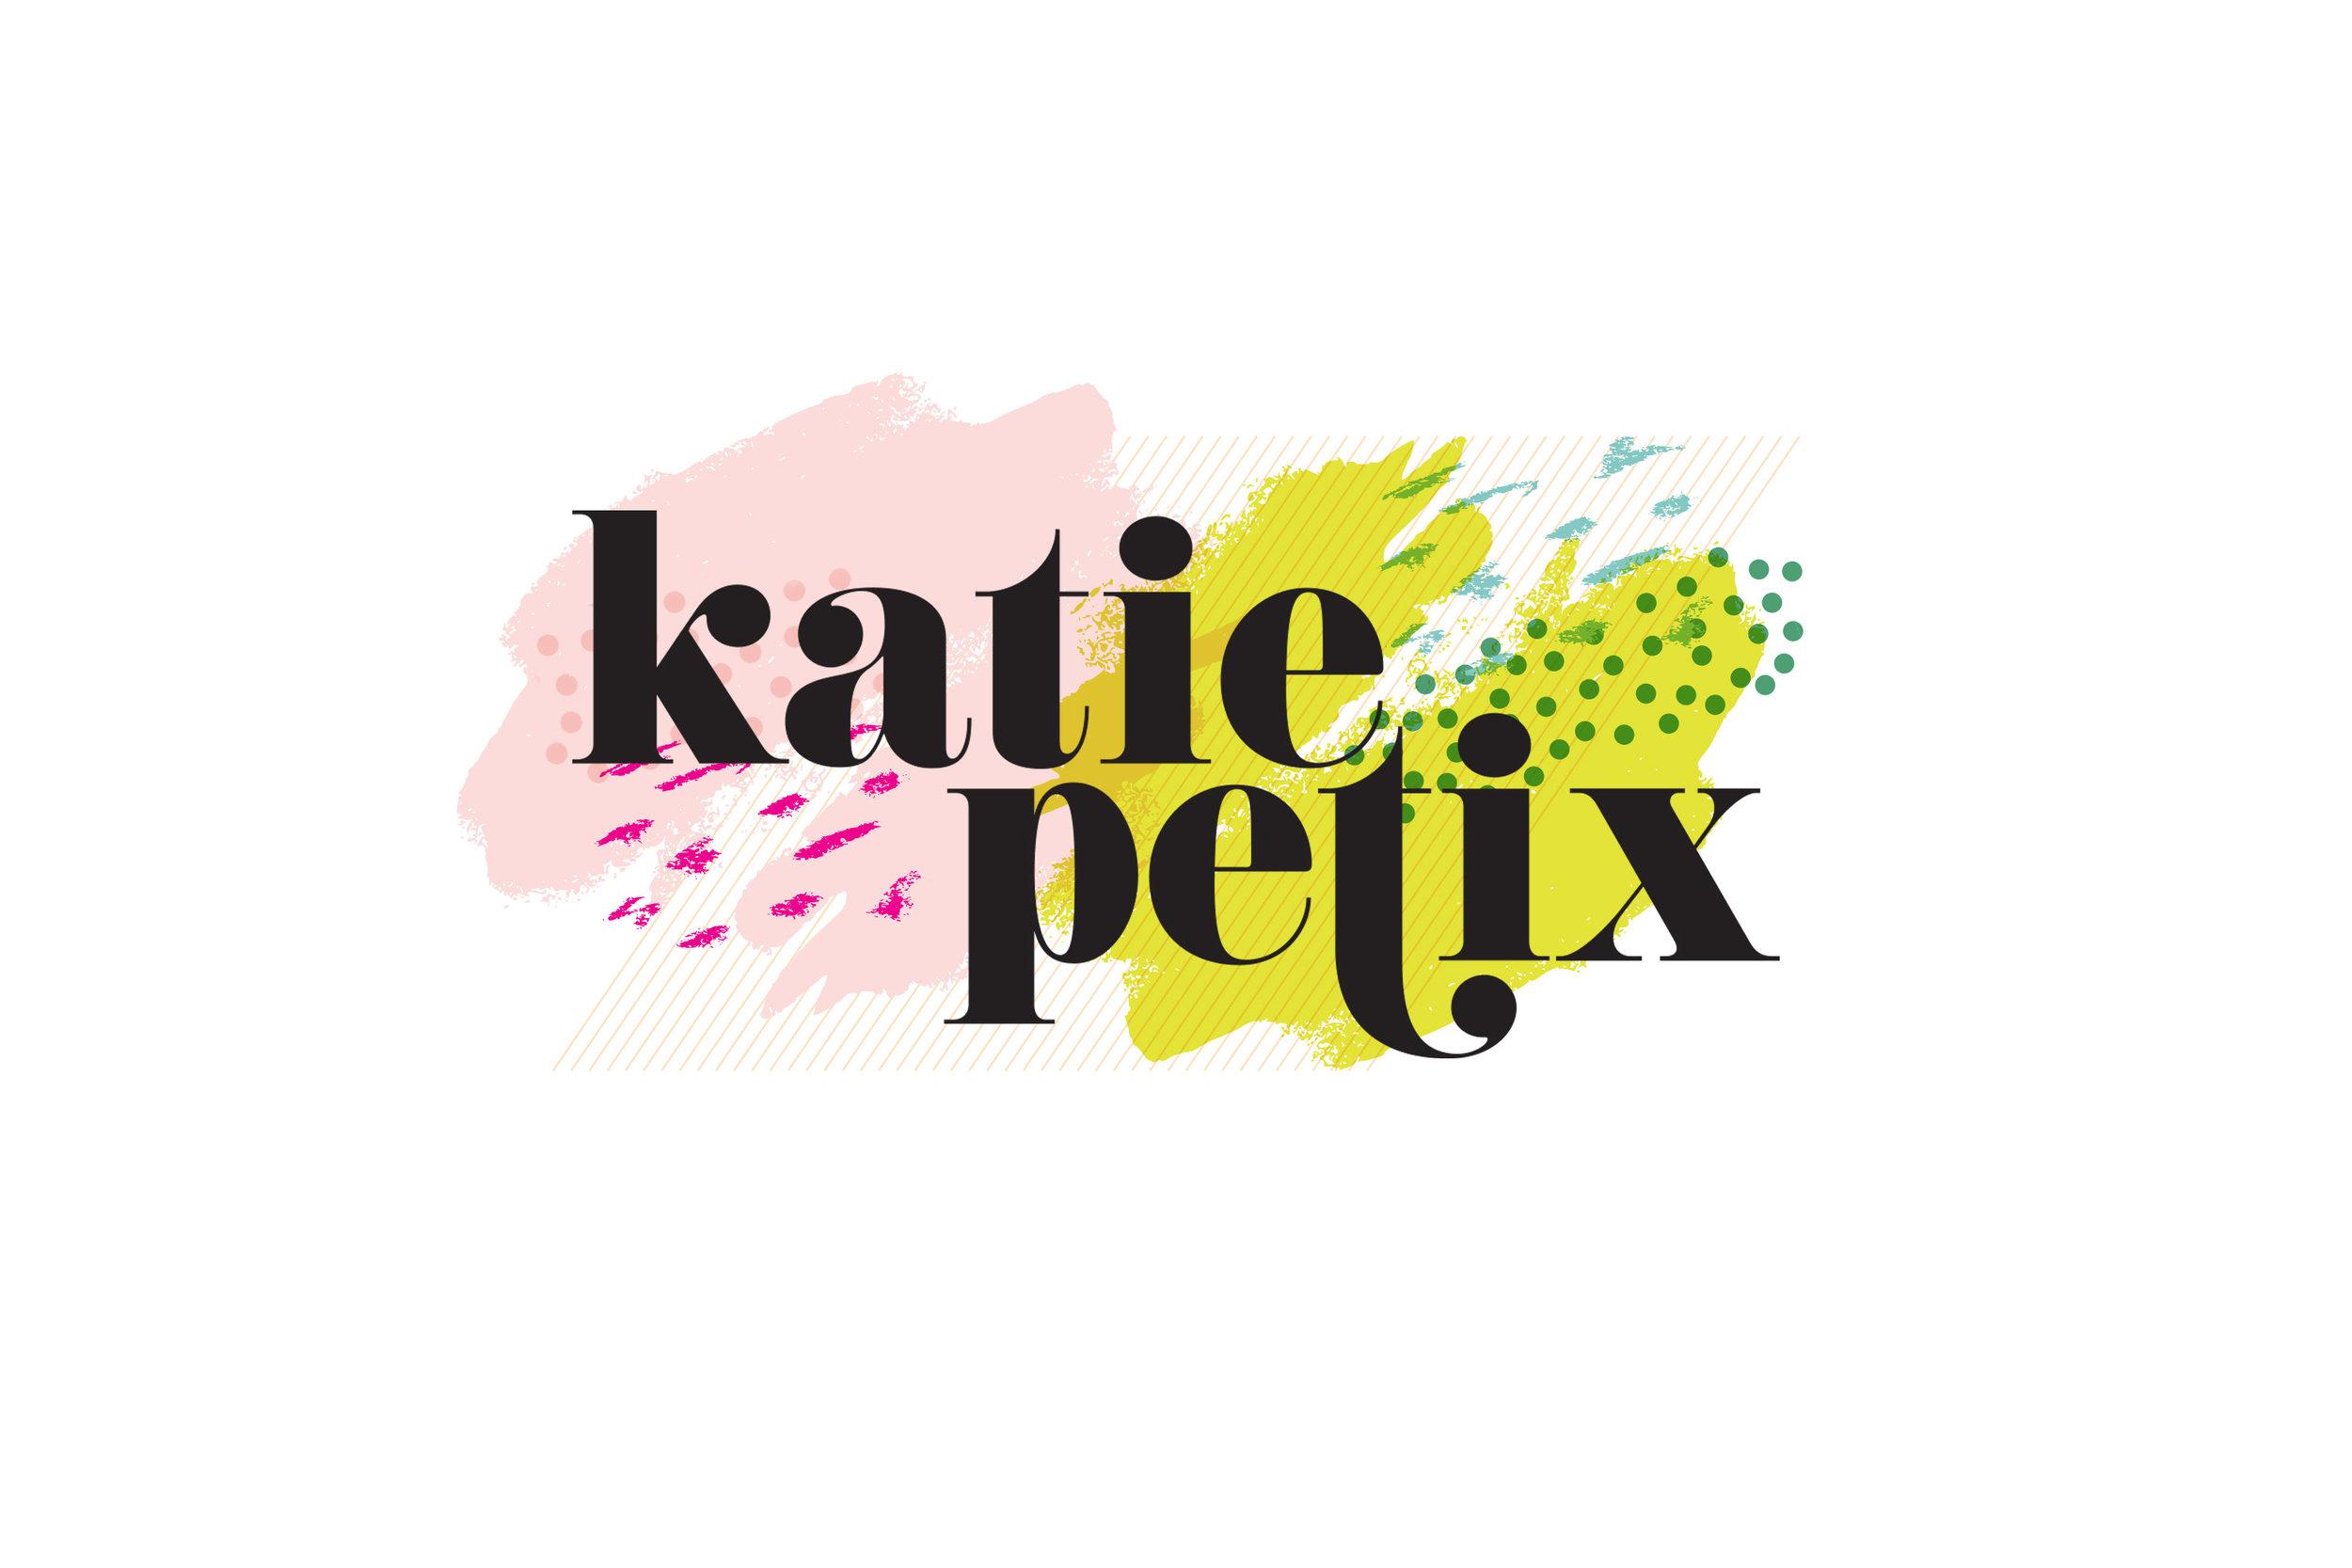 Katie-Petix-Social-Media-Manager-Bold-Fashion-Logo-01 copy.jpg